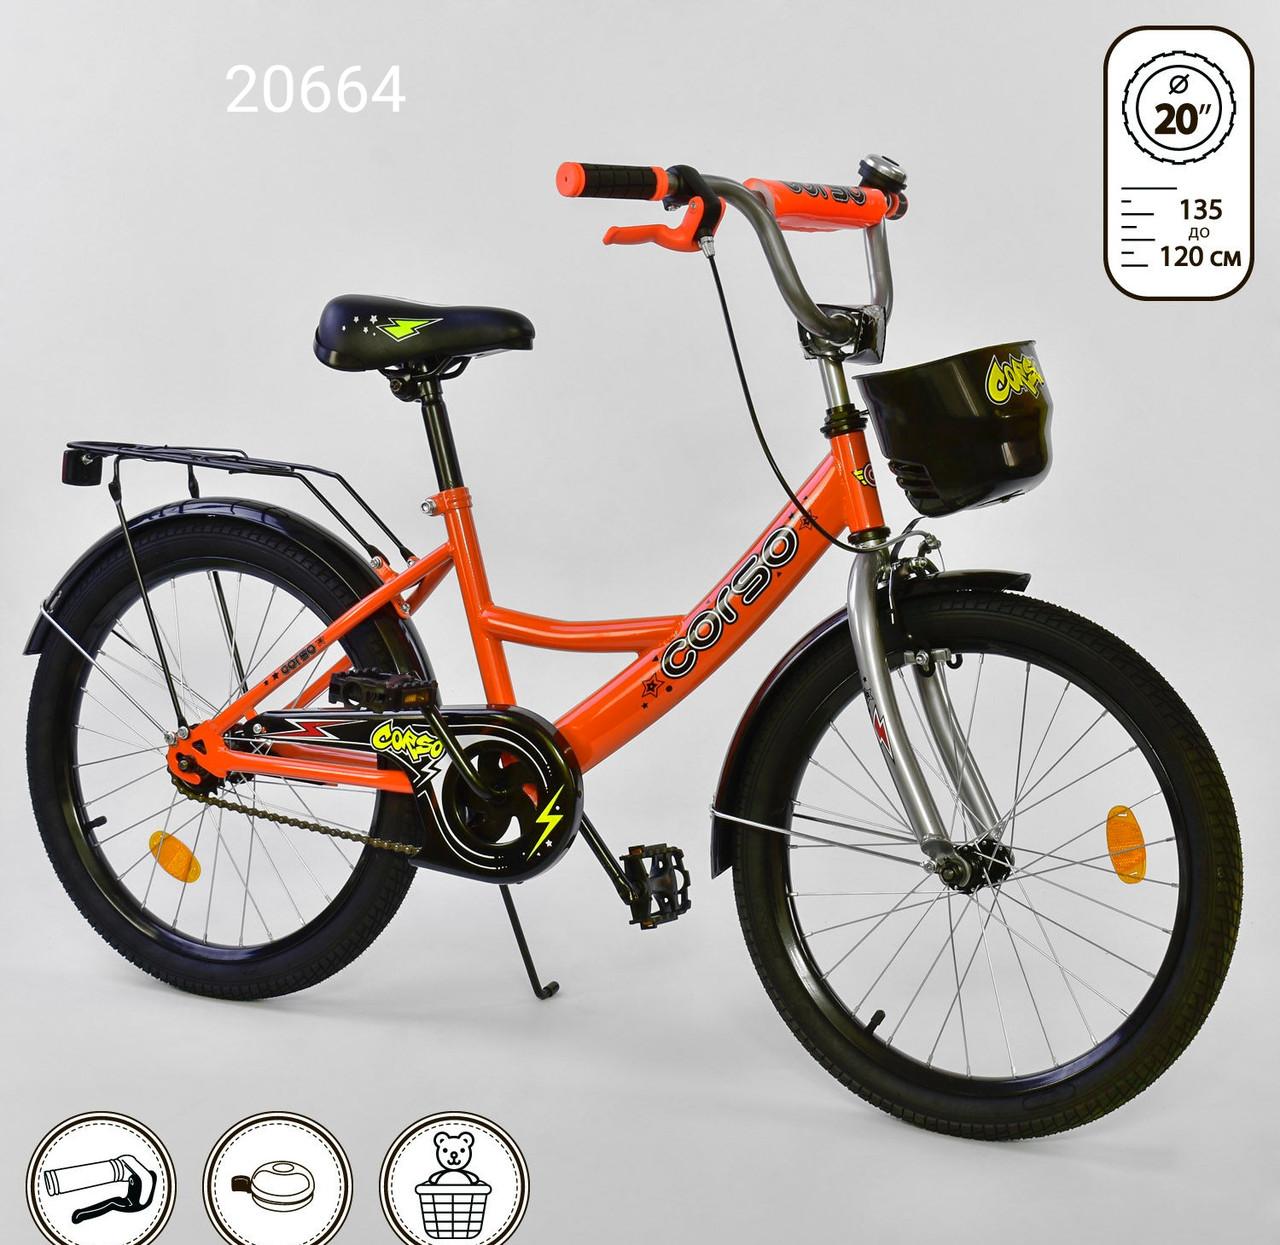 Велосипед Corso G 20 дюймов